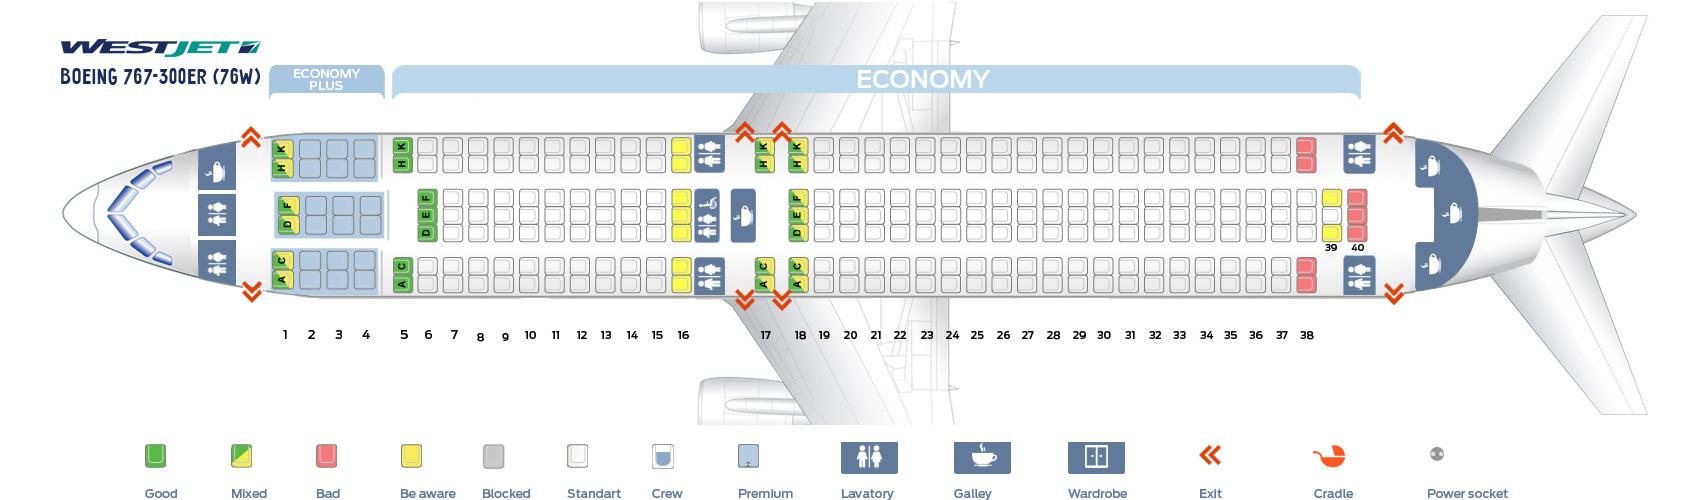 Seat Map Boeing 767-300ER WestJet